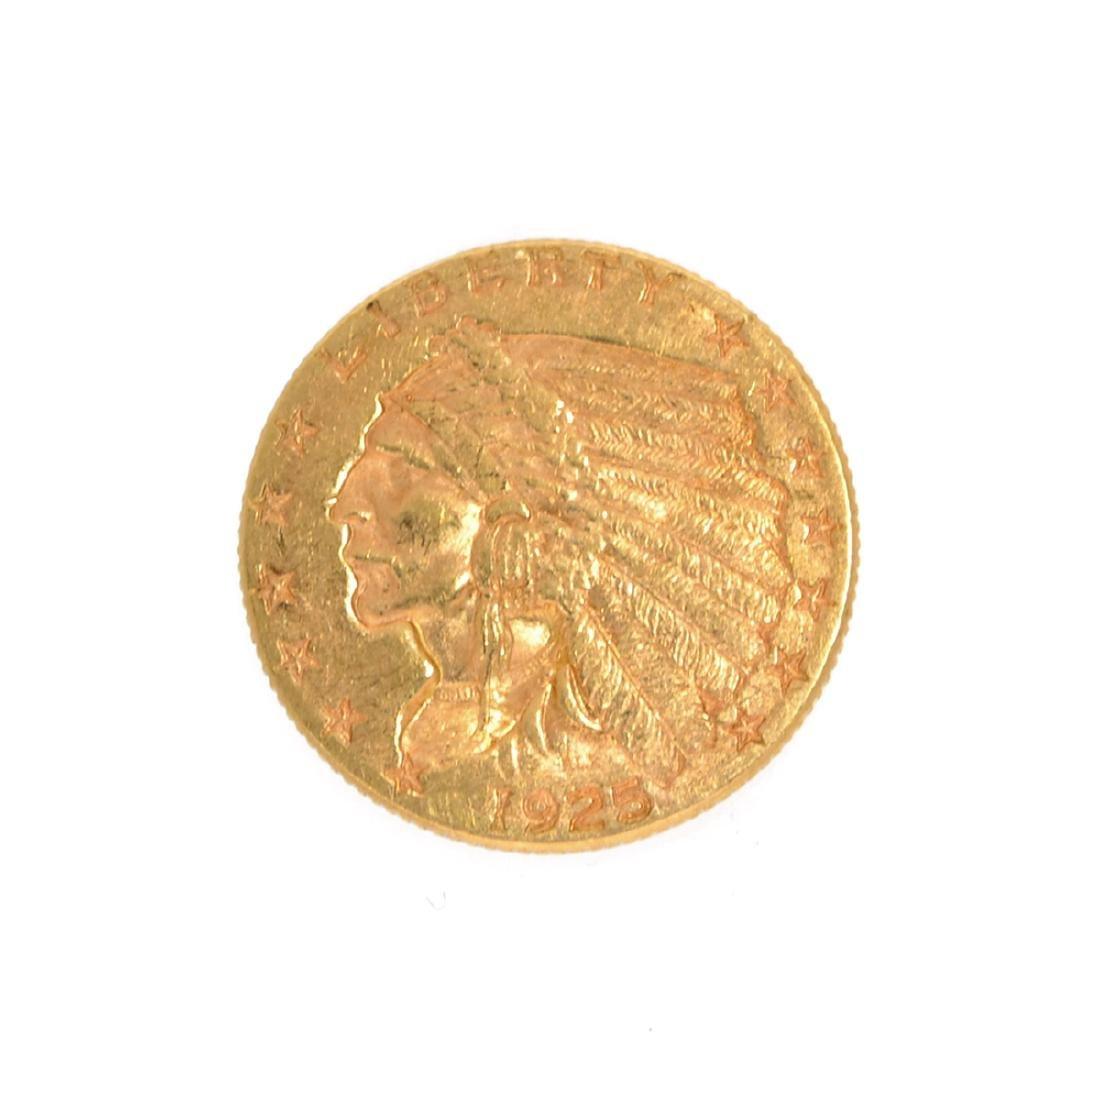 *1925-D $2.5 U.S. Indian Head Gold Coin (DF)